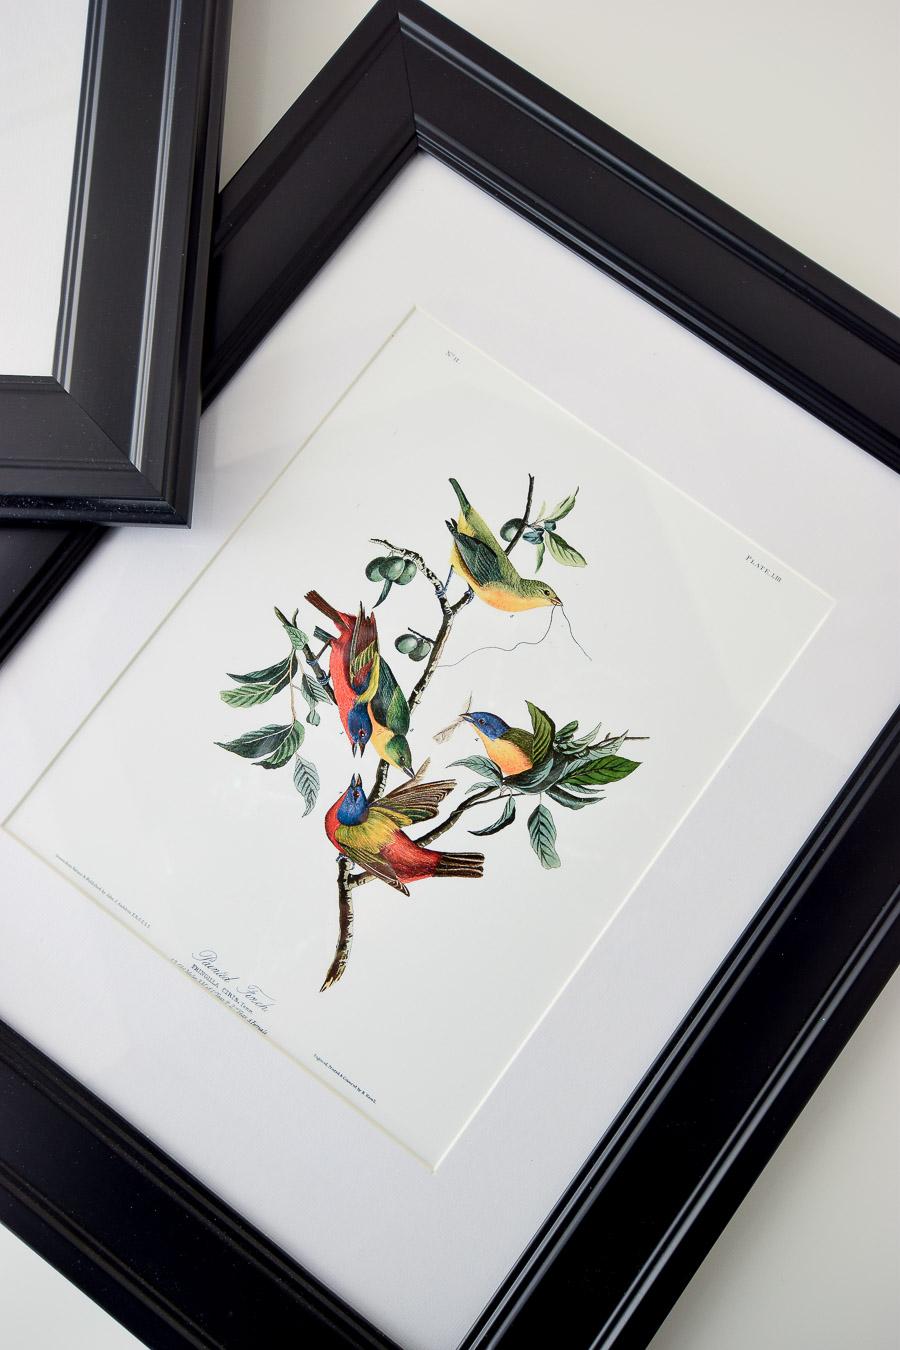 Free audubon botanical bird printables that look gorgeous when framed as wall art.